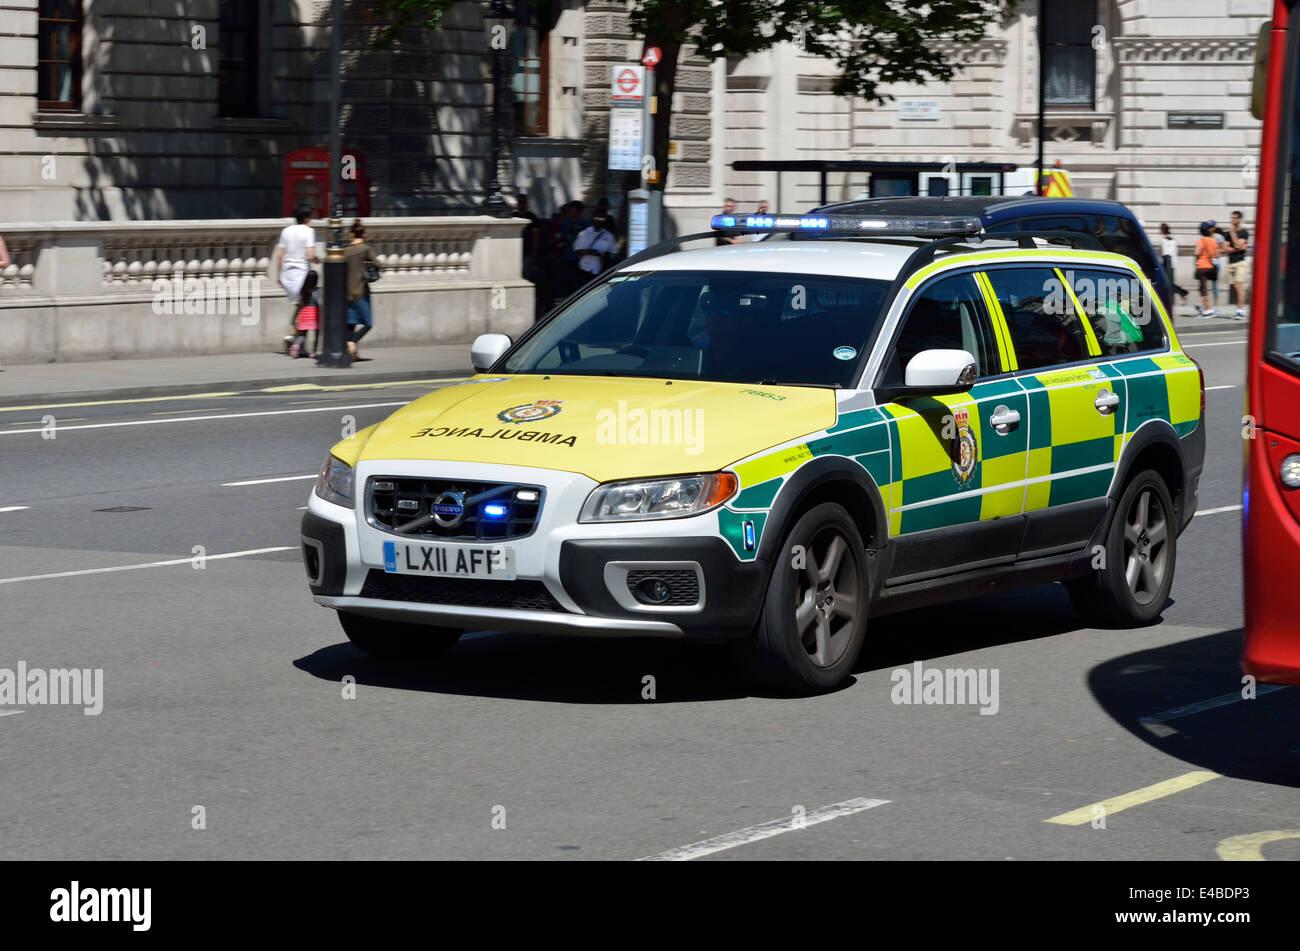 London ambulance volvo xc70 d5 rapid response car in